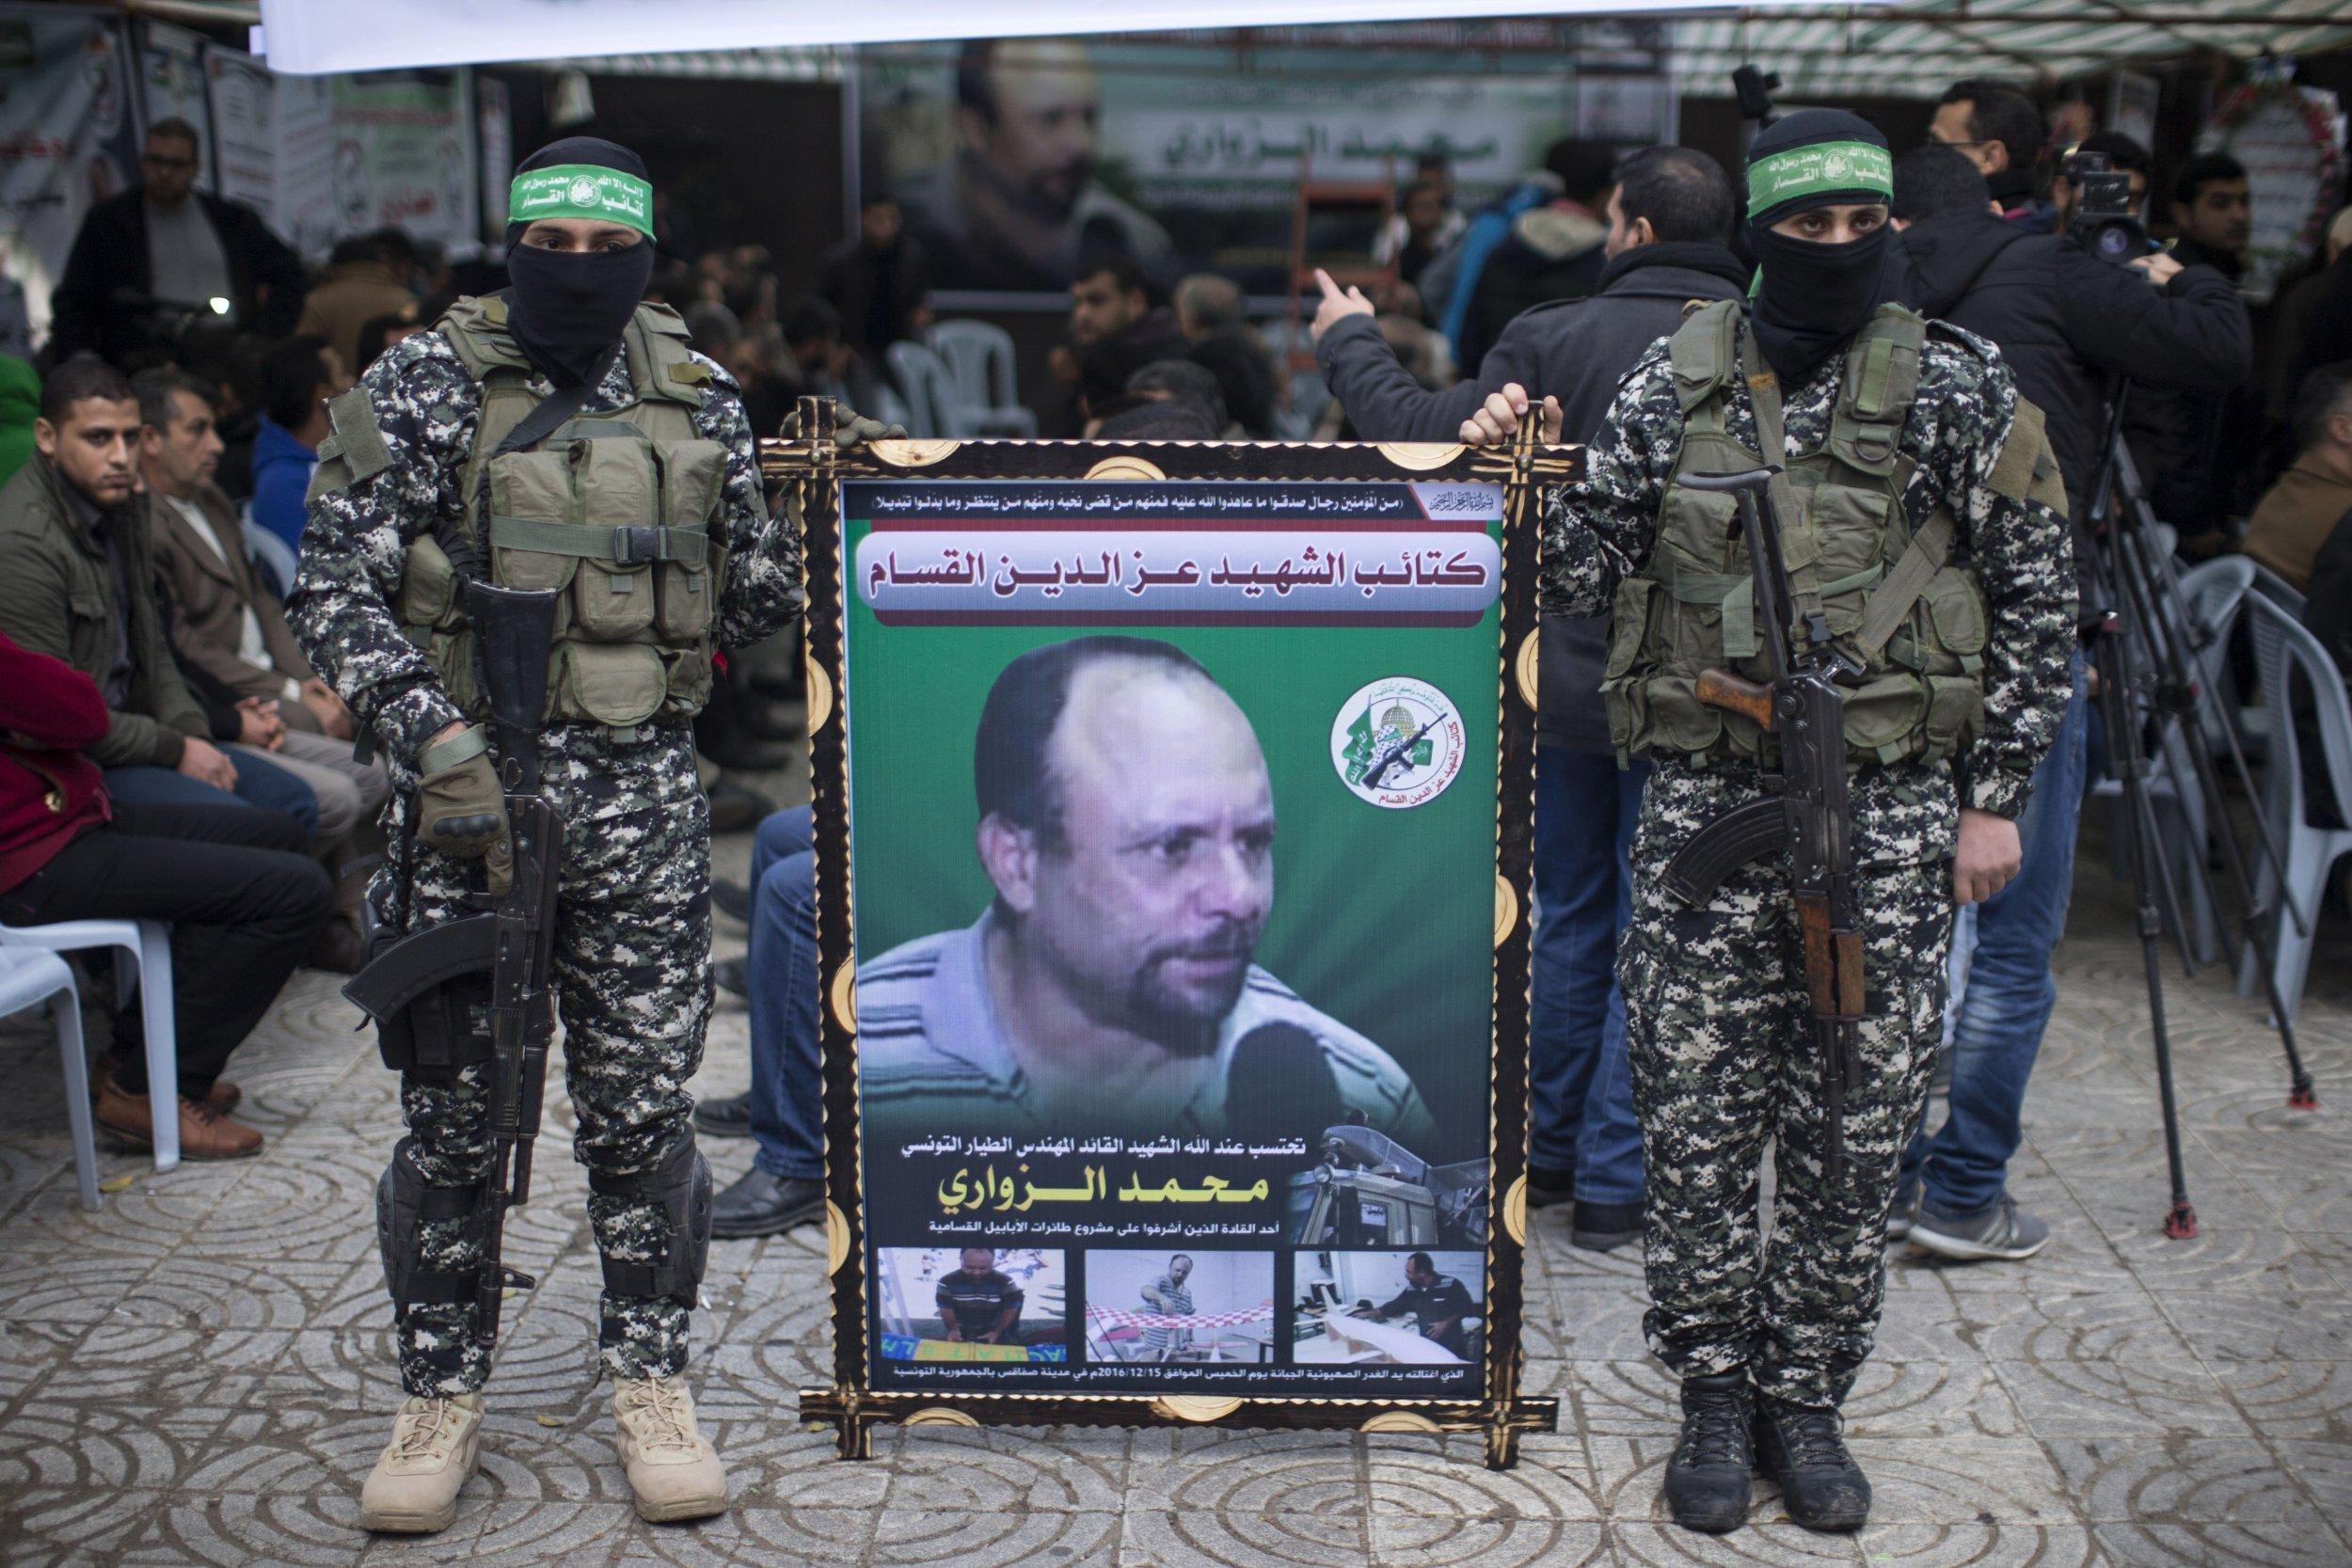 Hamas ceremony